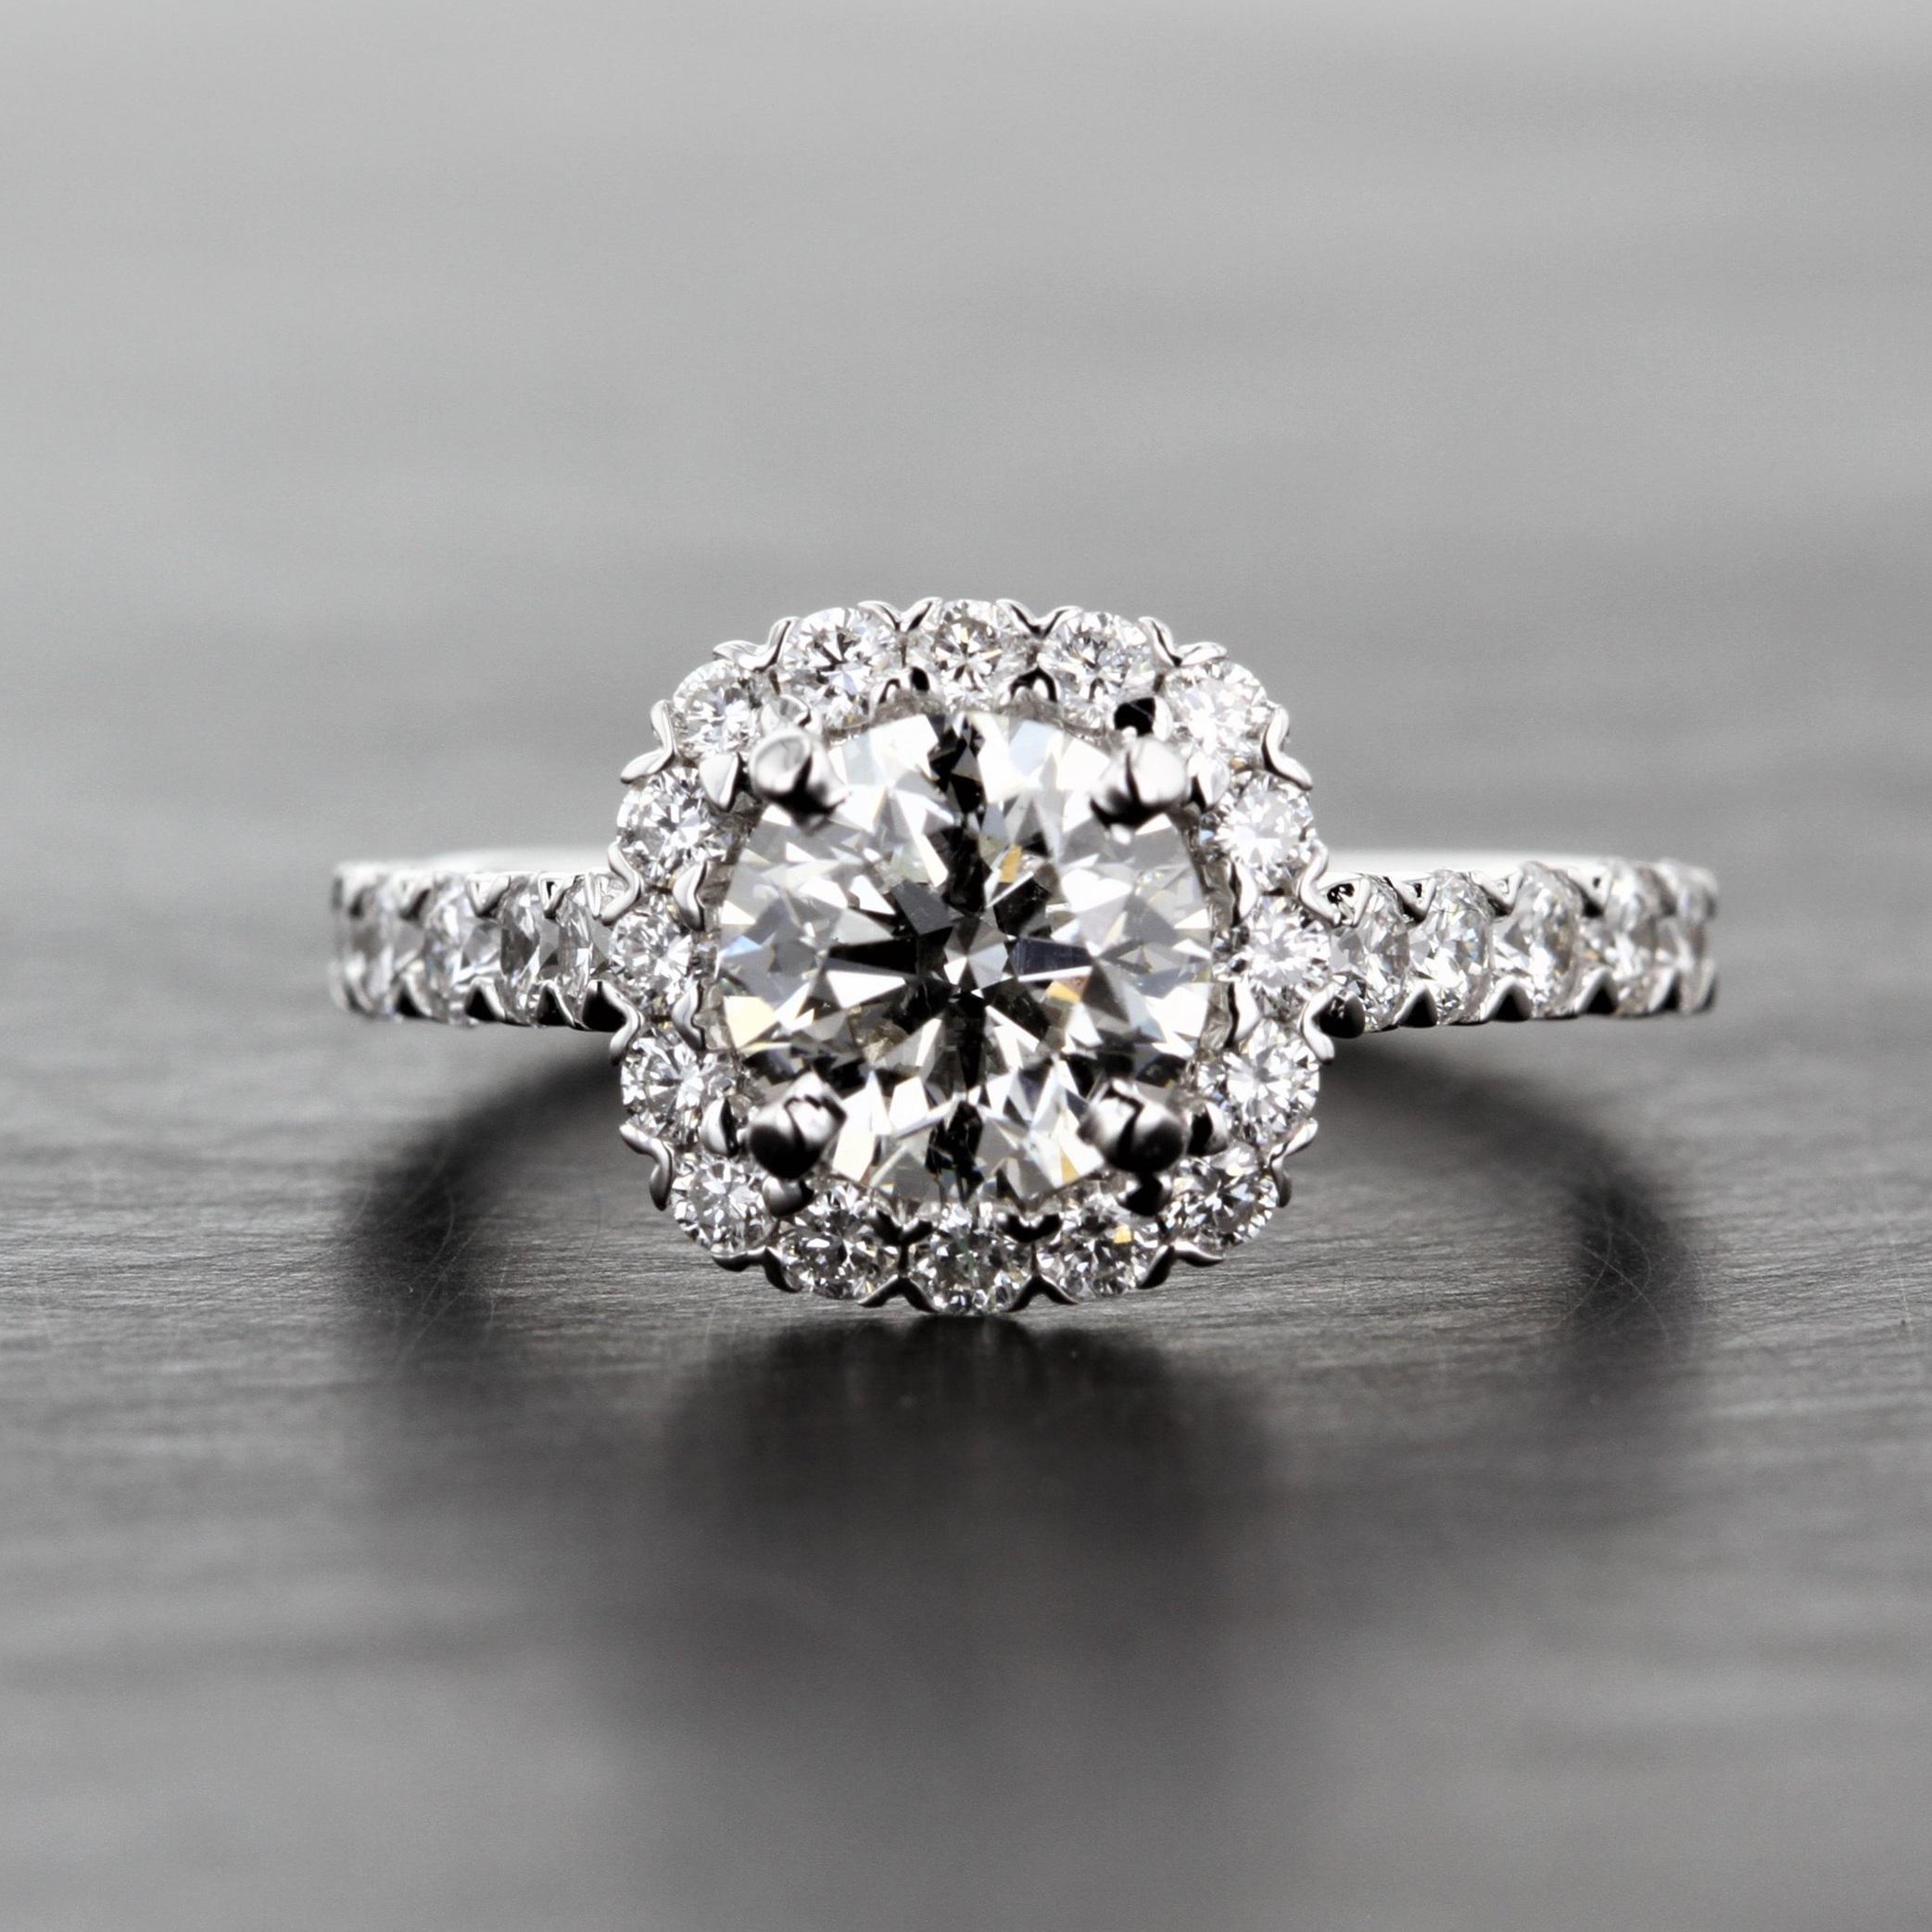 cushion-halo-round-diamond-white-gold-1ct-engagement-ring.jpg